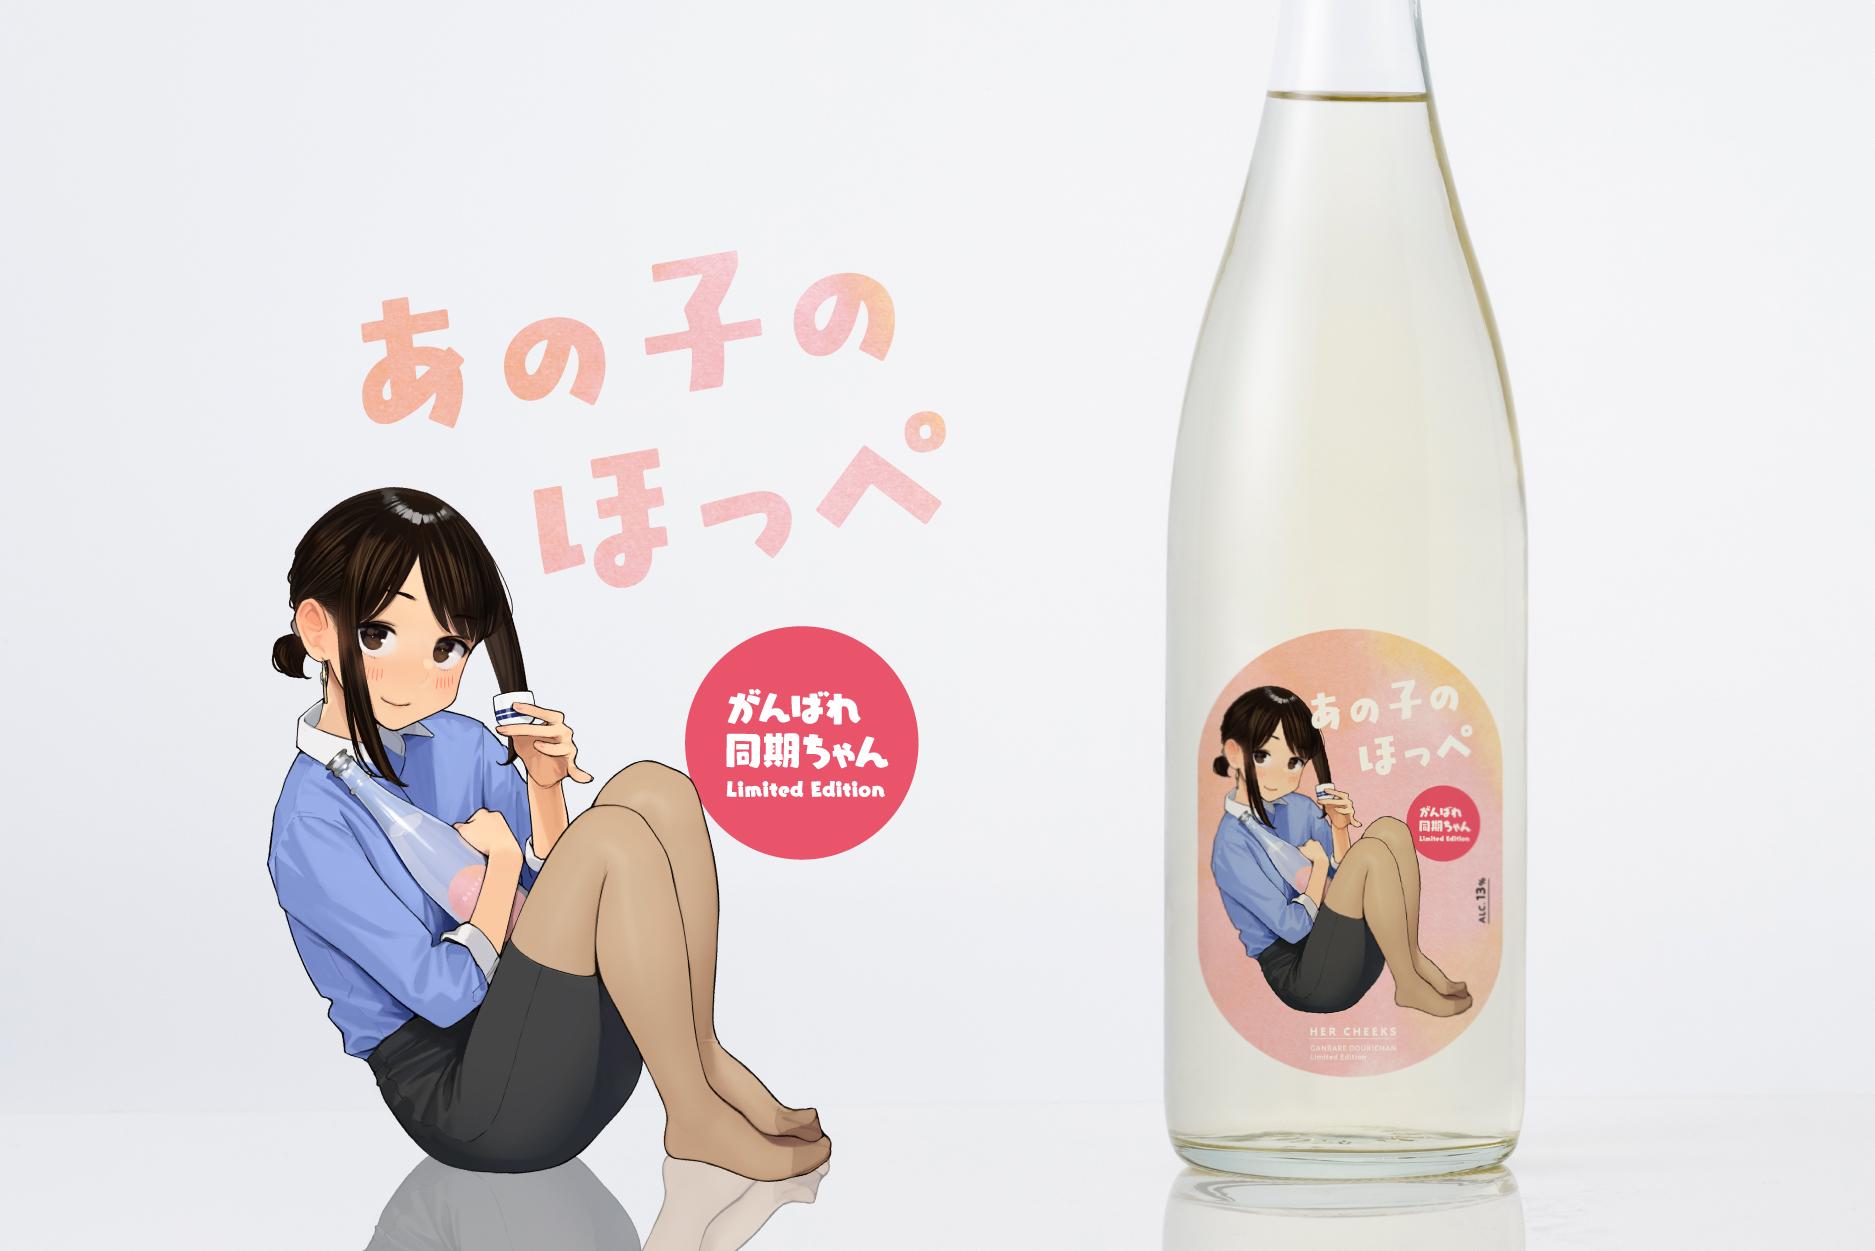 SNS上で人気の「がんばれ同期ちゃん」とコラボ!オリジナルラベル酒や限定酒で春を感じるセット誕生